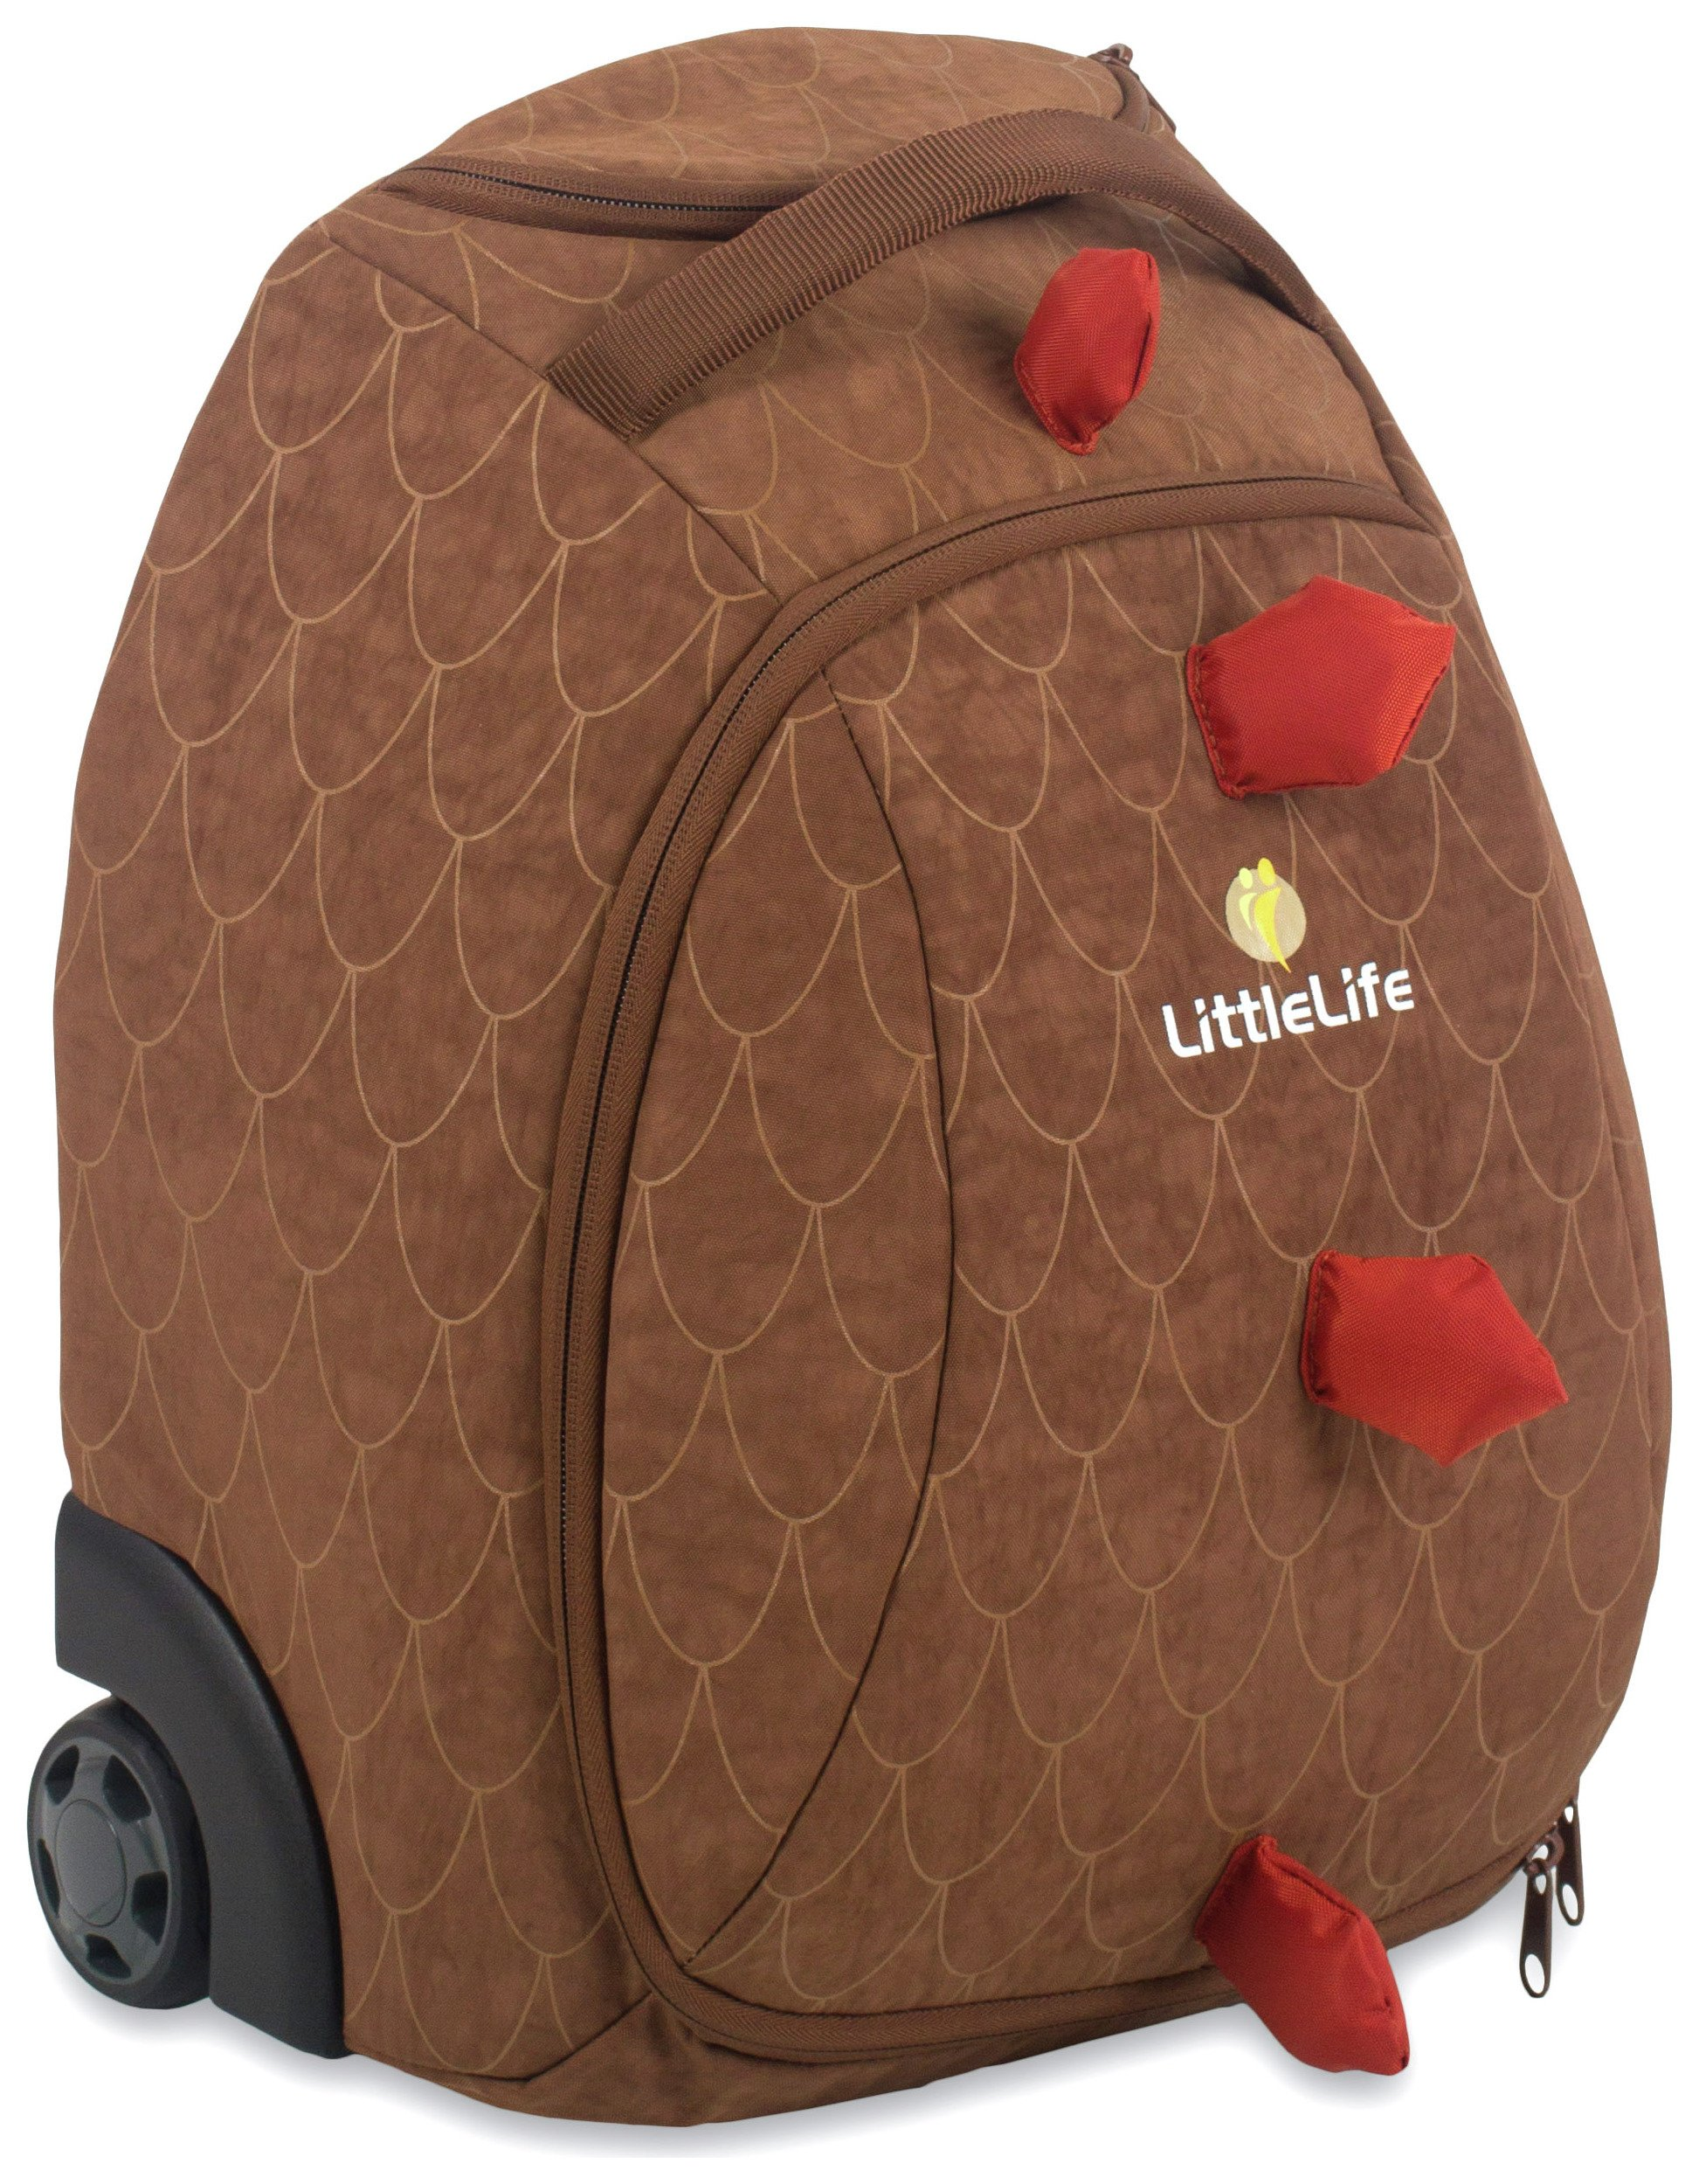 Buy LittleLife Animal Kids Suitcase - Dinosaur at Argos.co.uk ...